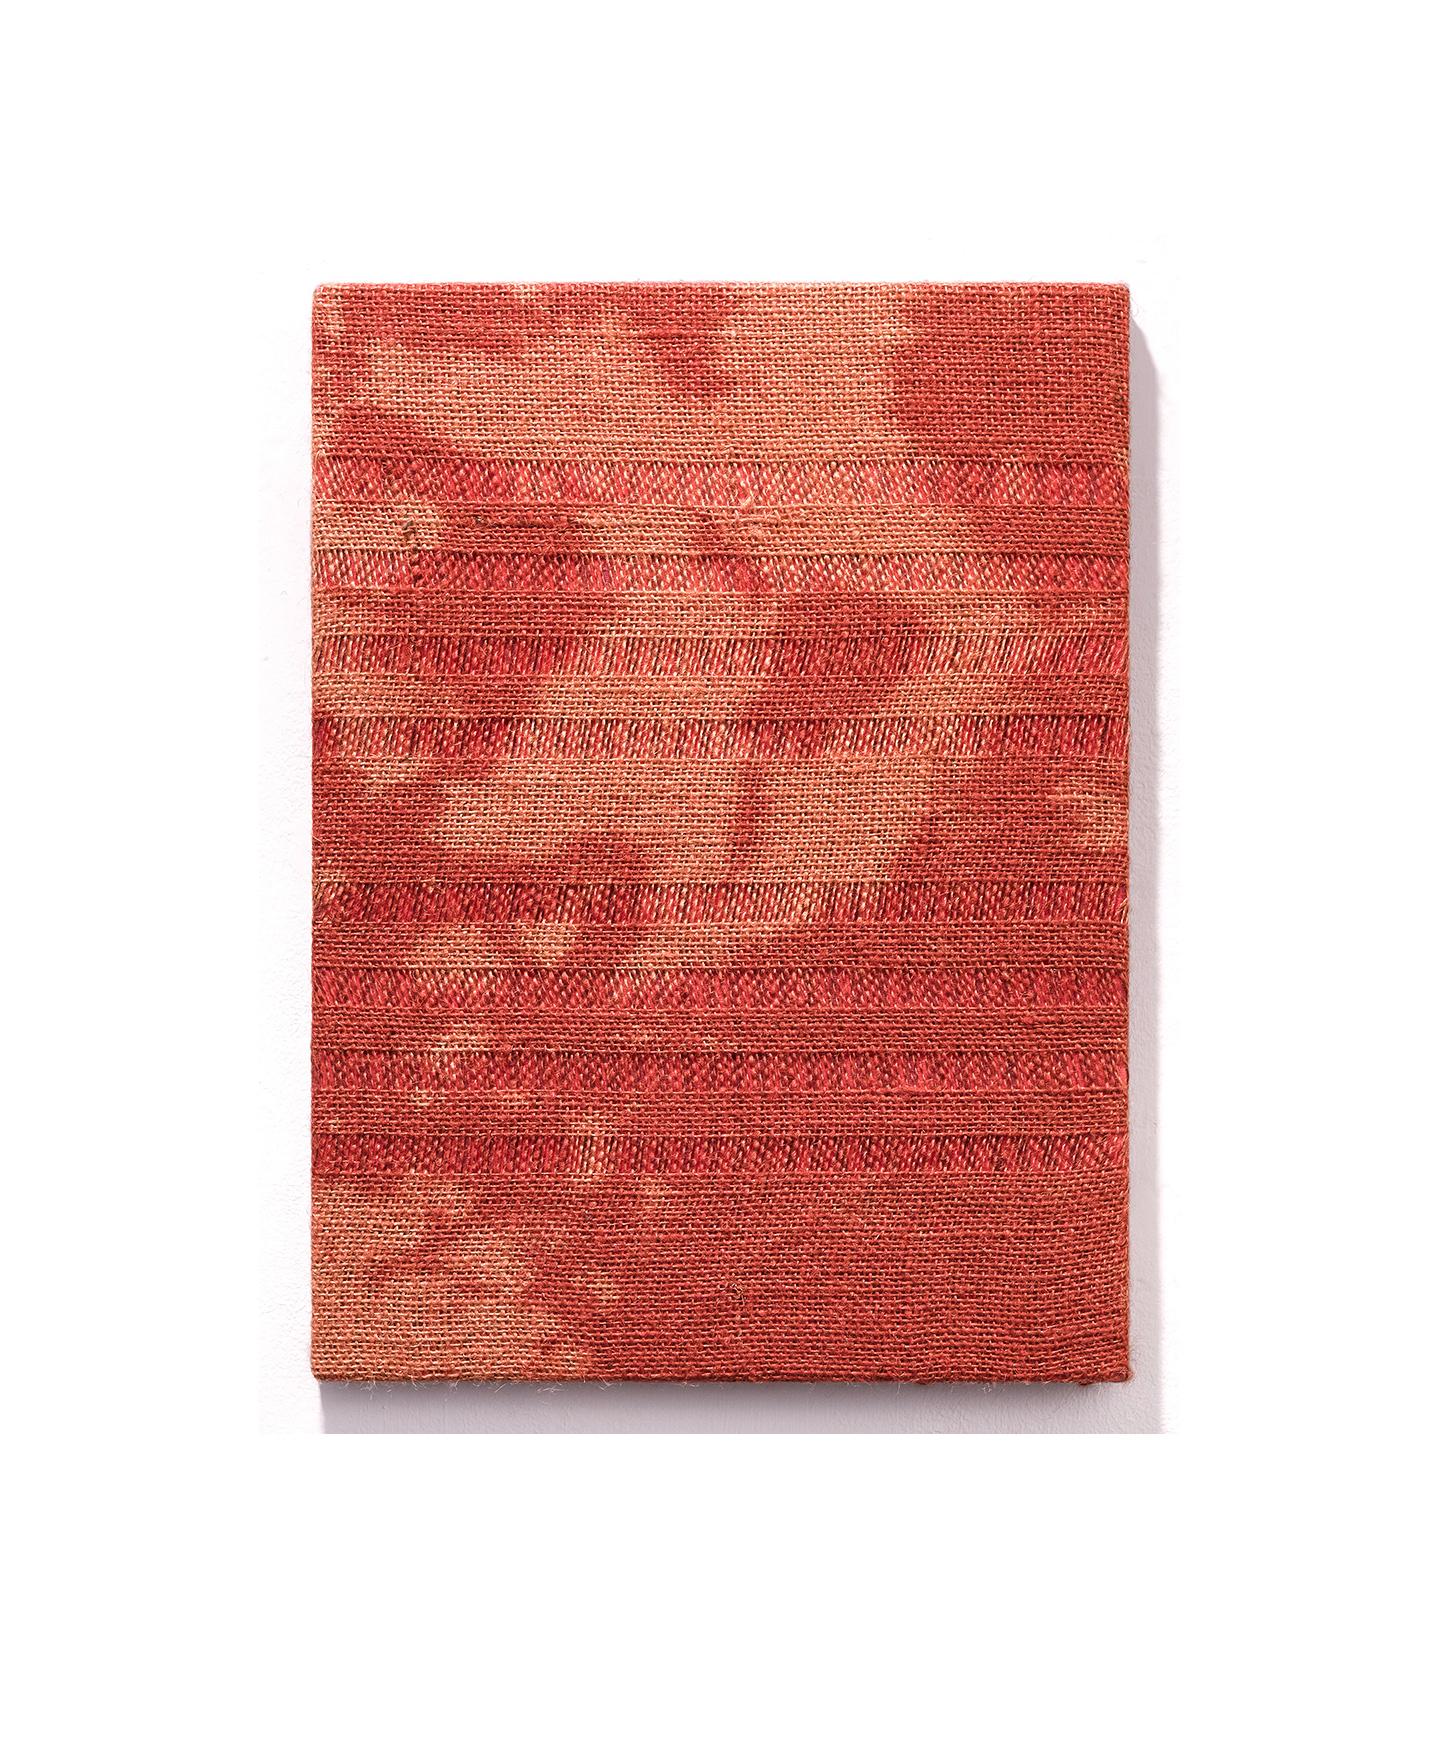 "gregory kaplowitz, Martin Riley (4) Unwoven burlap, bleach, acrylic paint, and cotton jersey over cradled board. 16"" x 12"" $1,500"